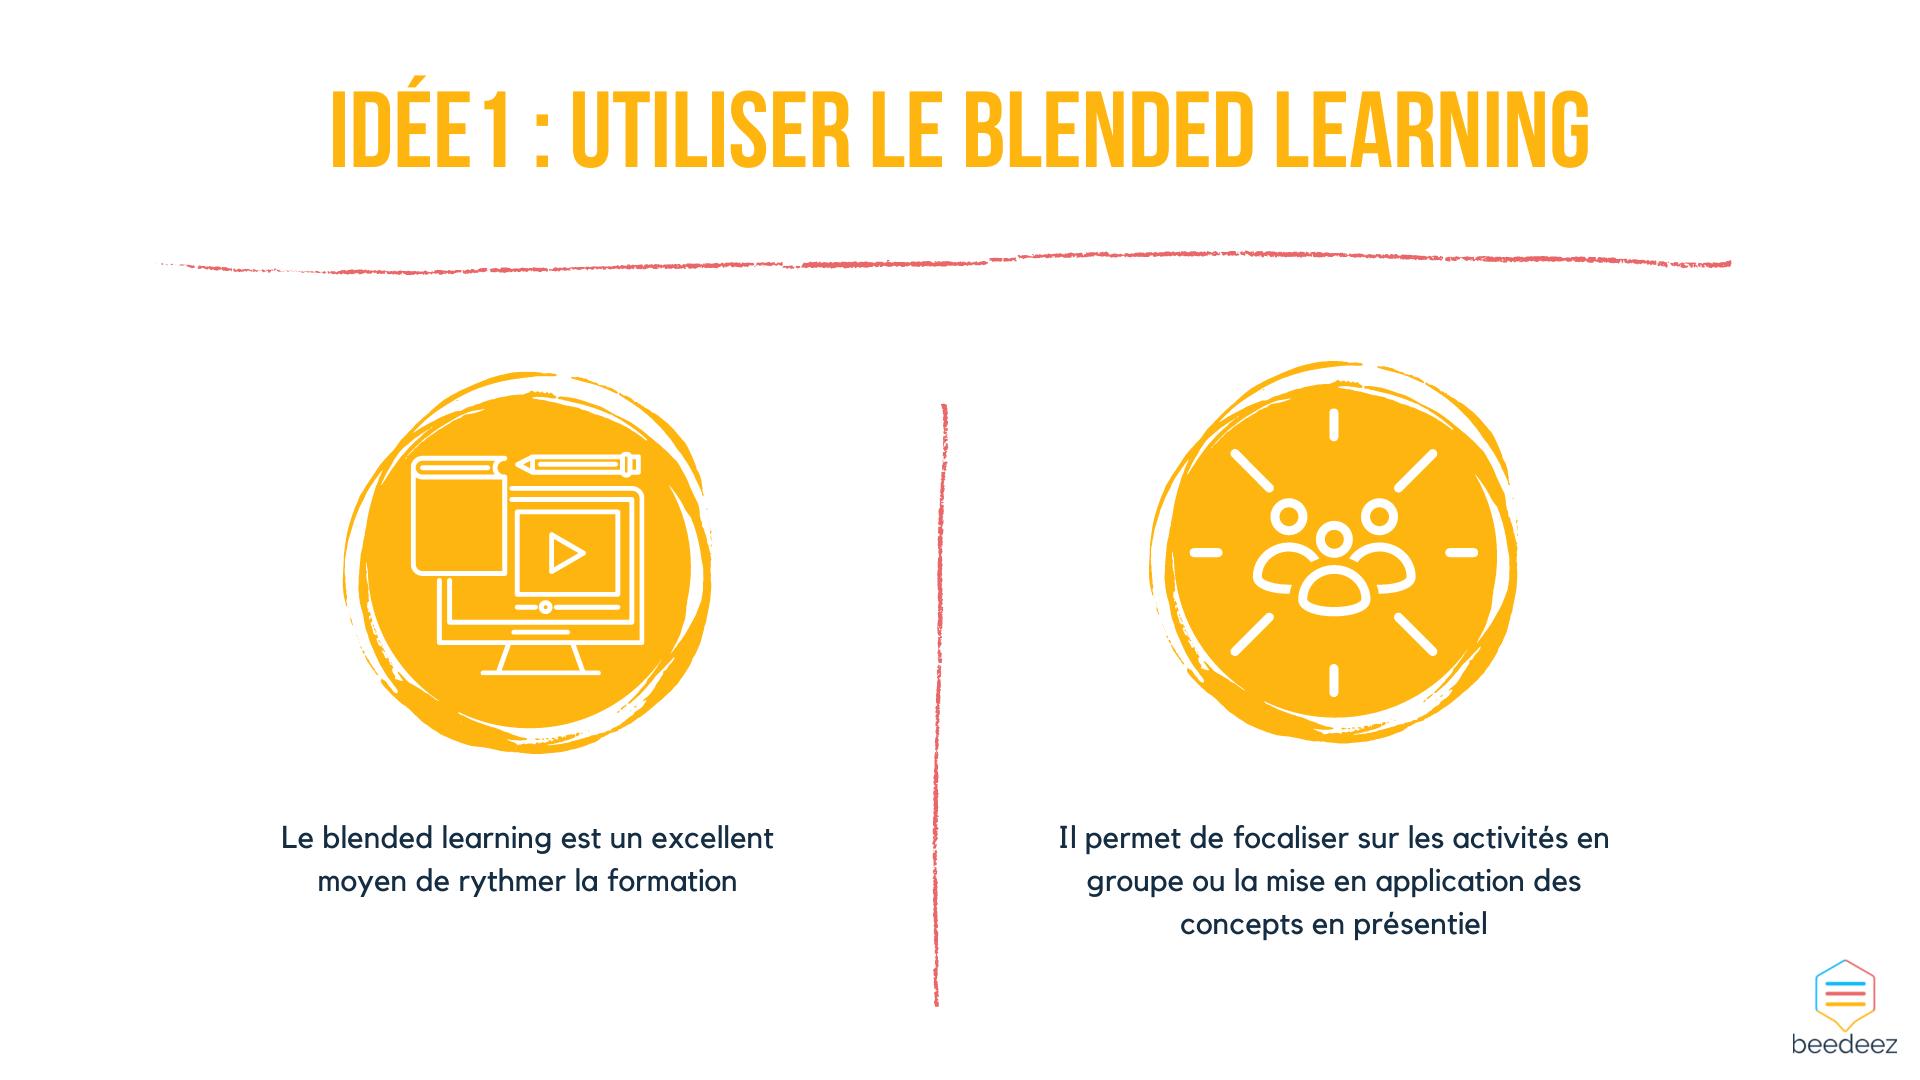 Utiliser le blended learning